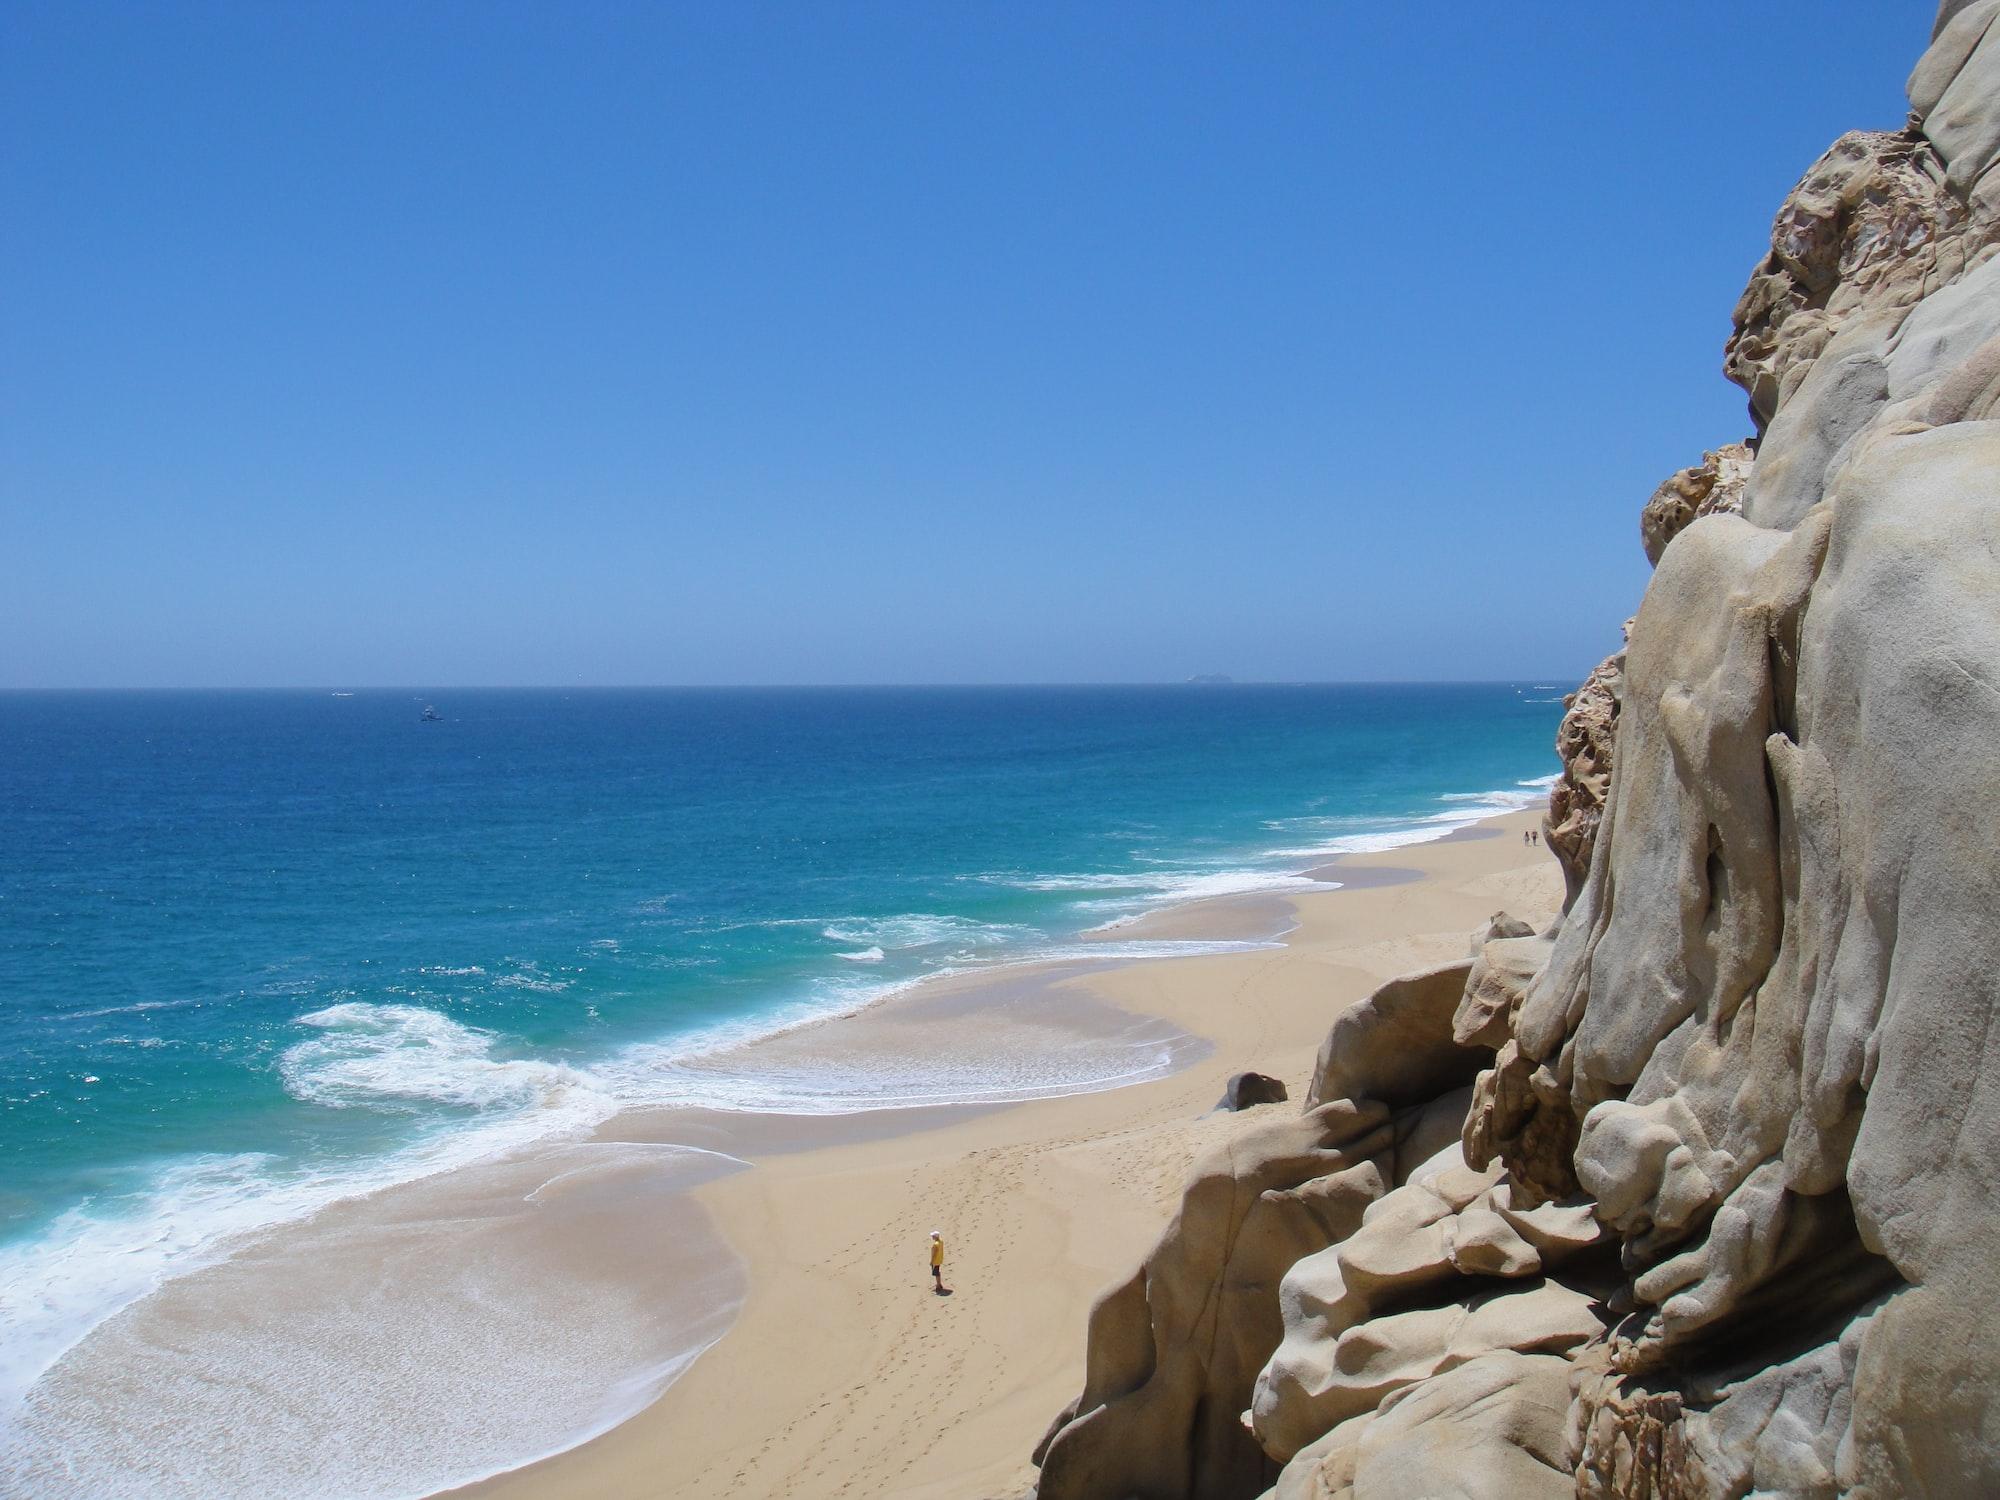 Cliff on a sandy coastline